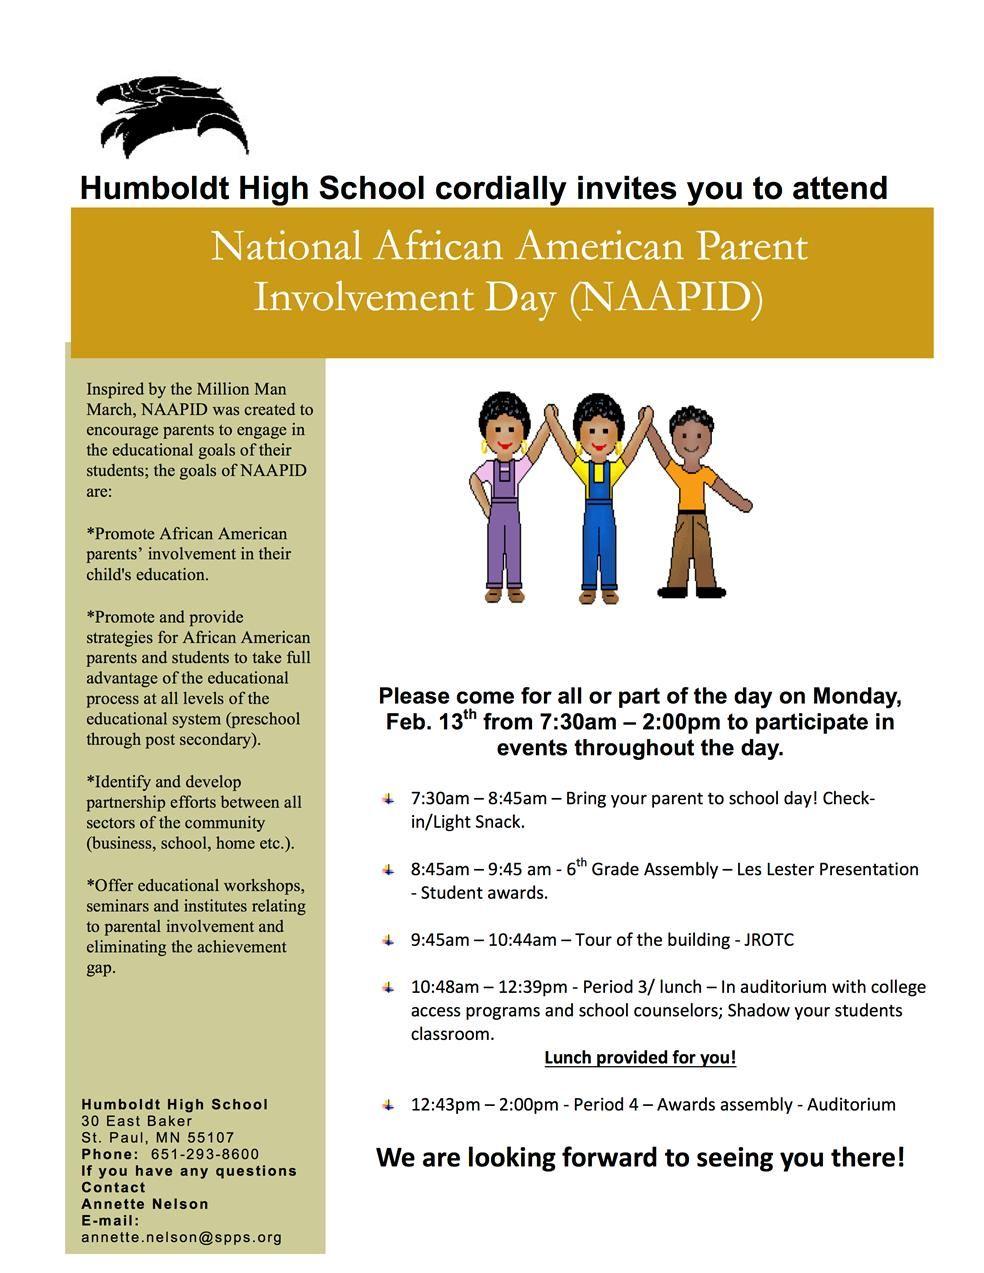 humboldt high school homepage national african american parent involvement day humboldt high school